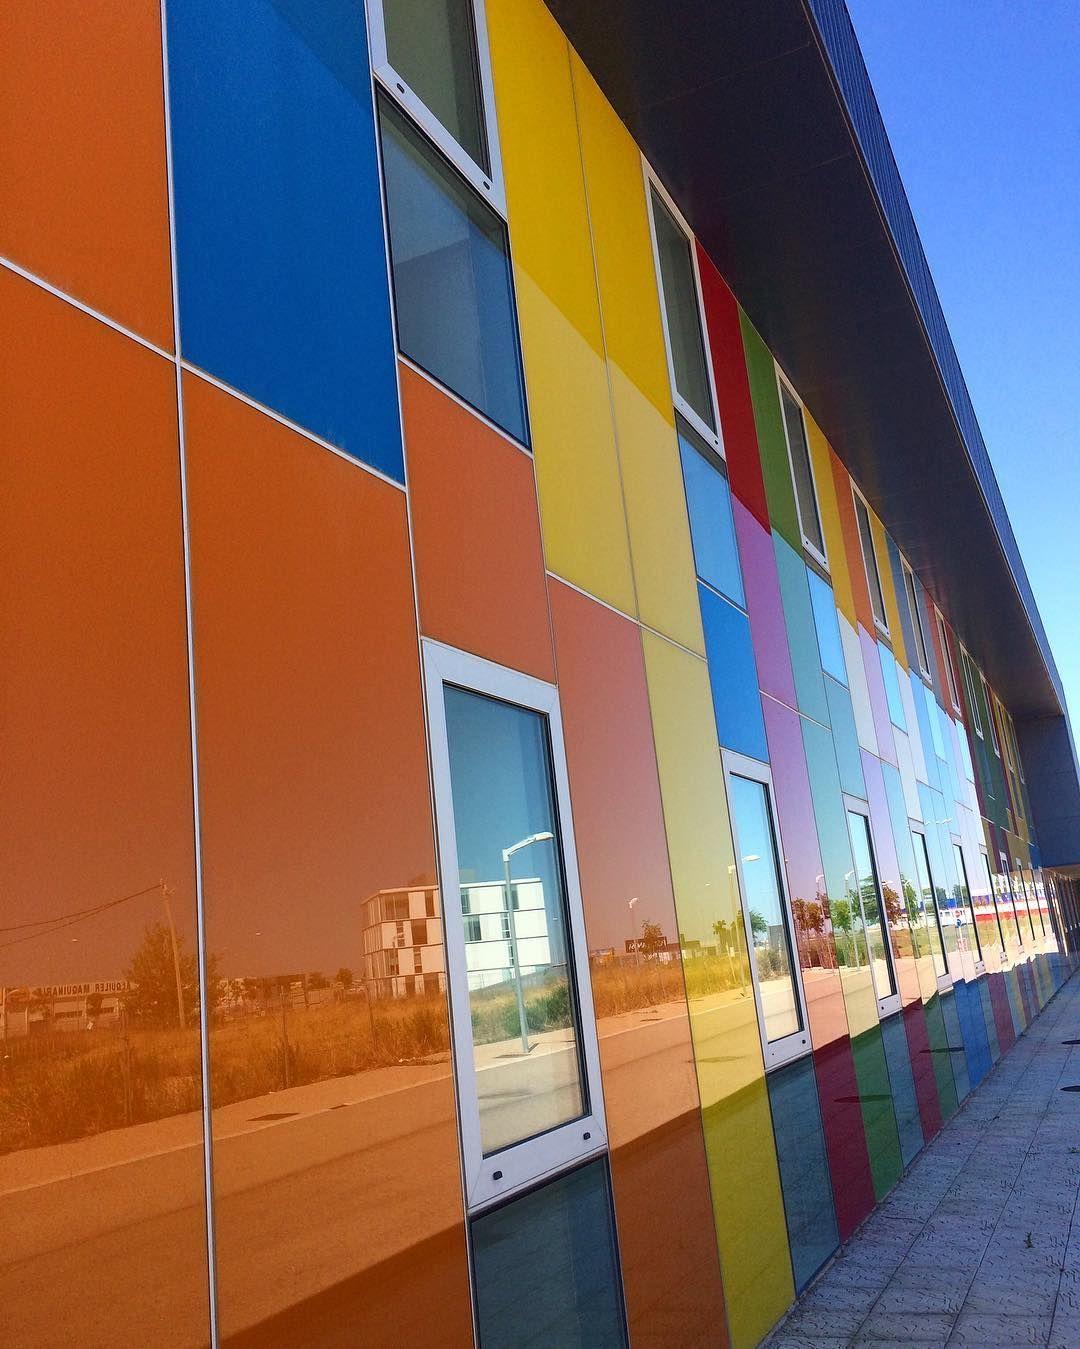 Viva Los Colores Guardería En Plaza Zaragoza Architecture Ok Streets Streetphotography Street Igersaragon Ige Street Photography Instagram Zaragoza